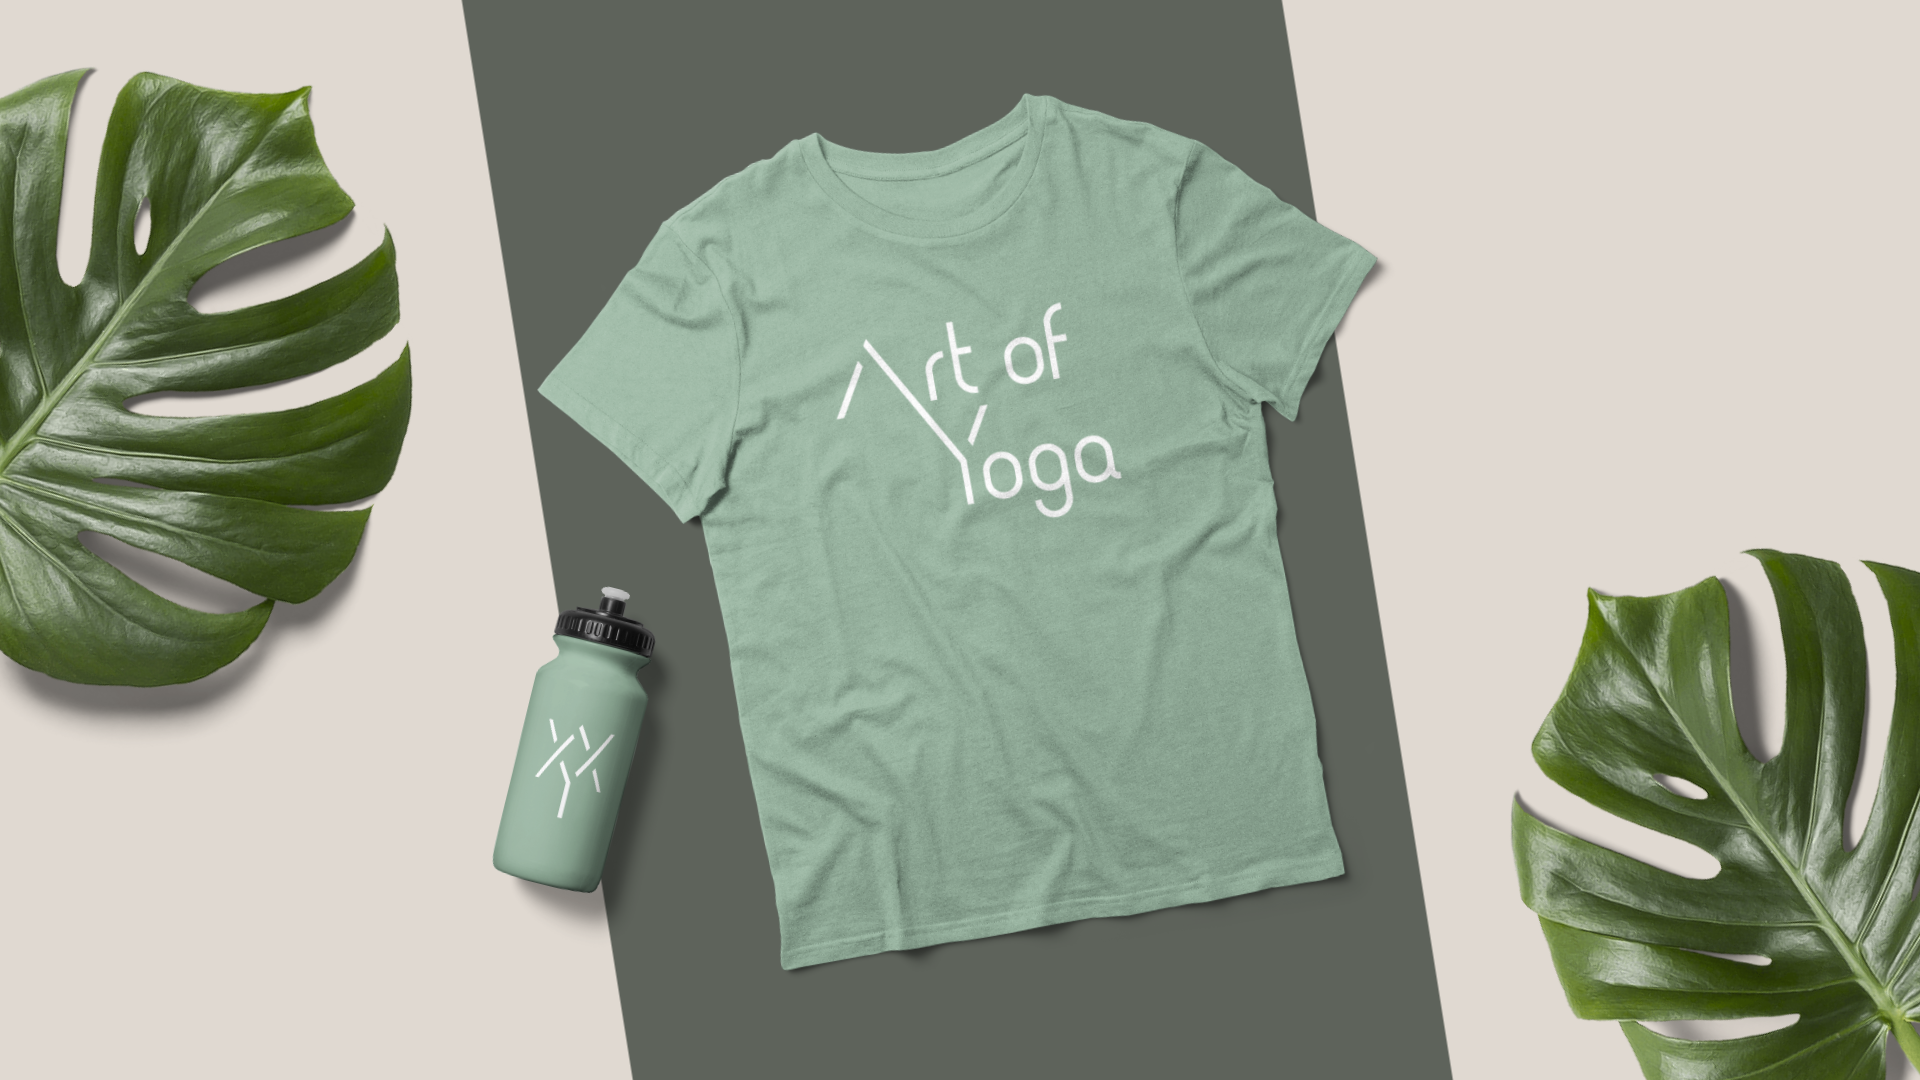 Art of Yoga swag